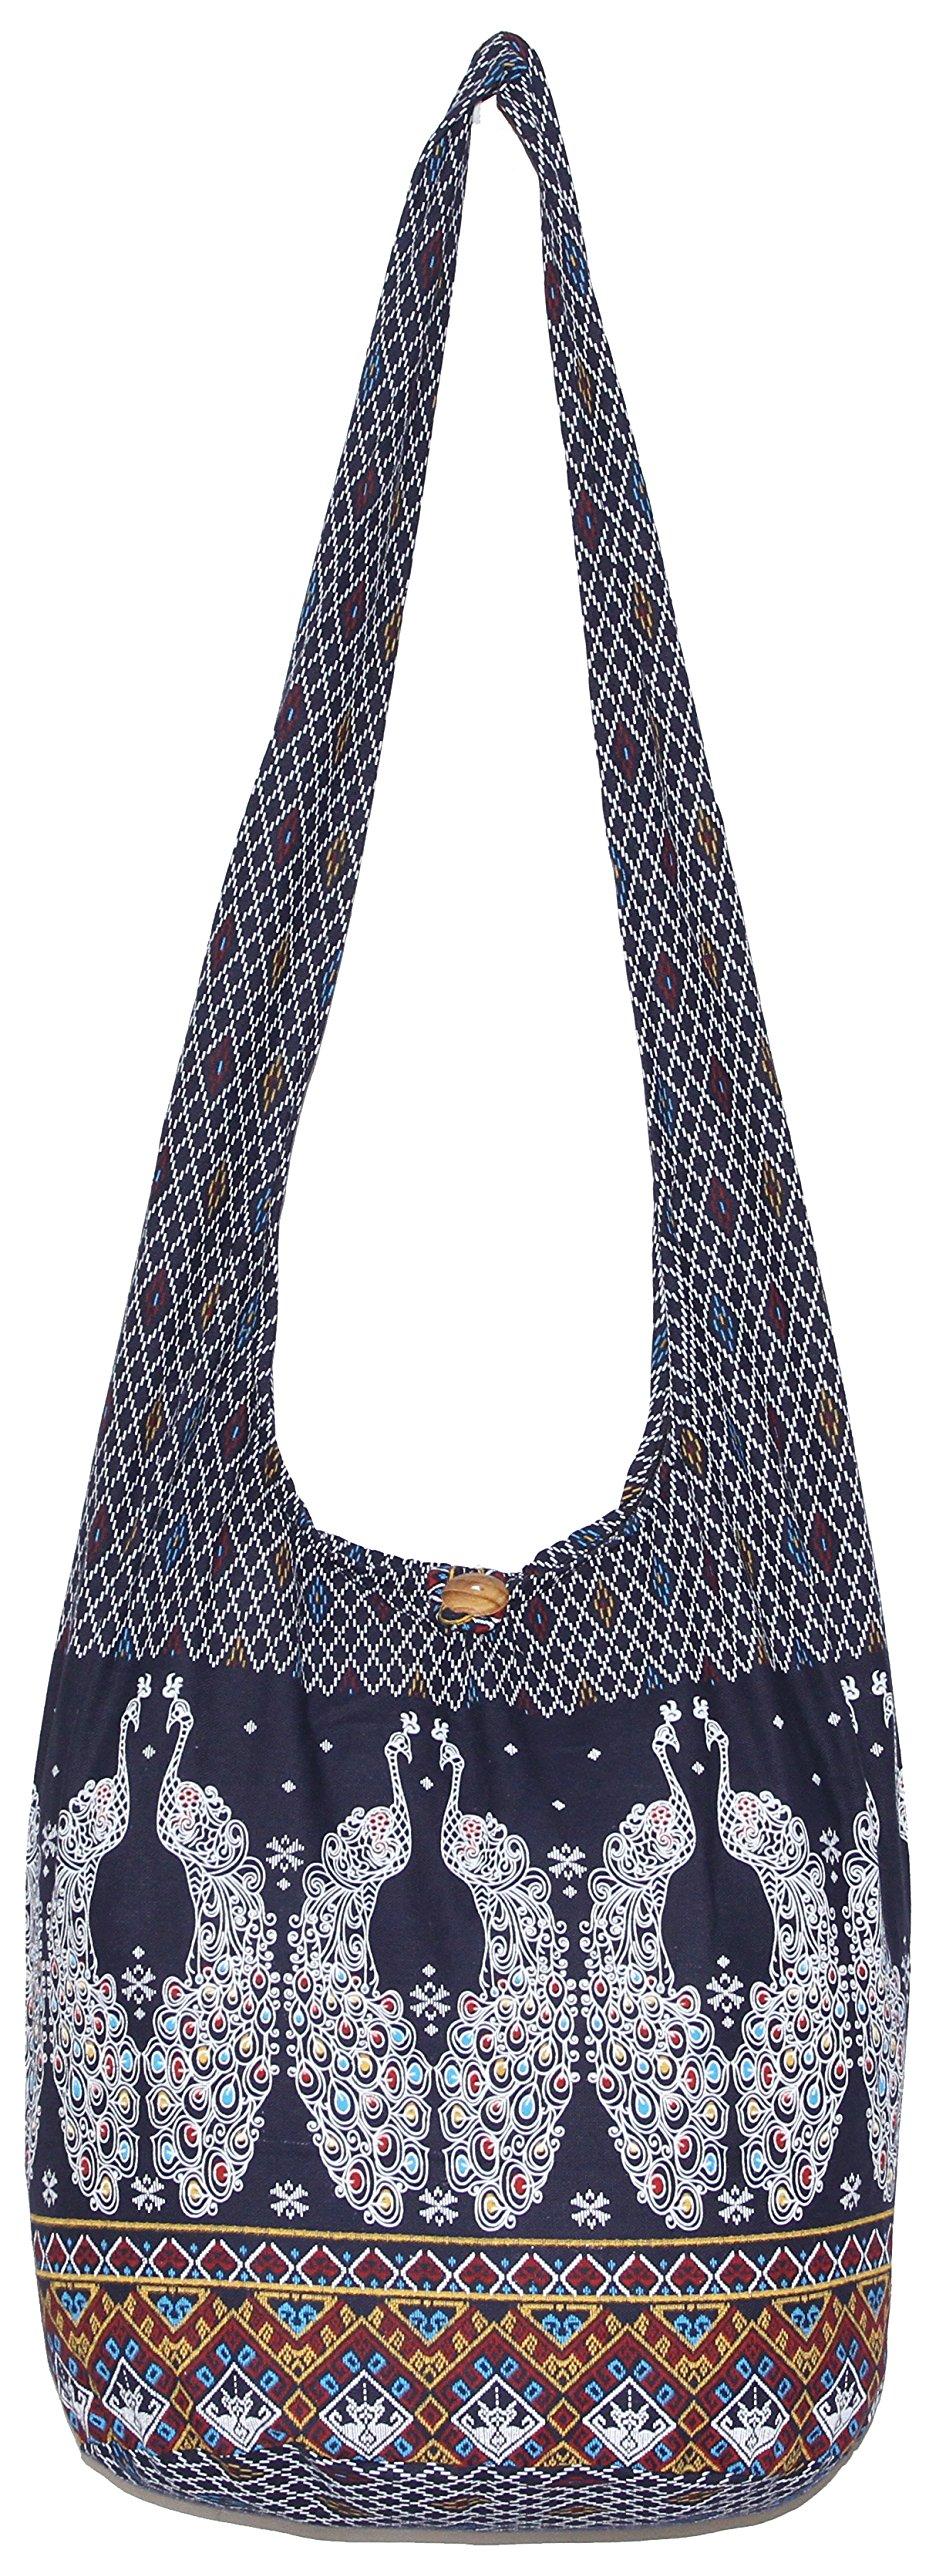 Peacock Colorful Bohemian Hobo Hippie Crossbody Shoulder Bag (DarkBlue)